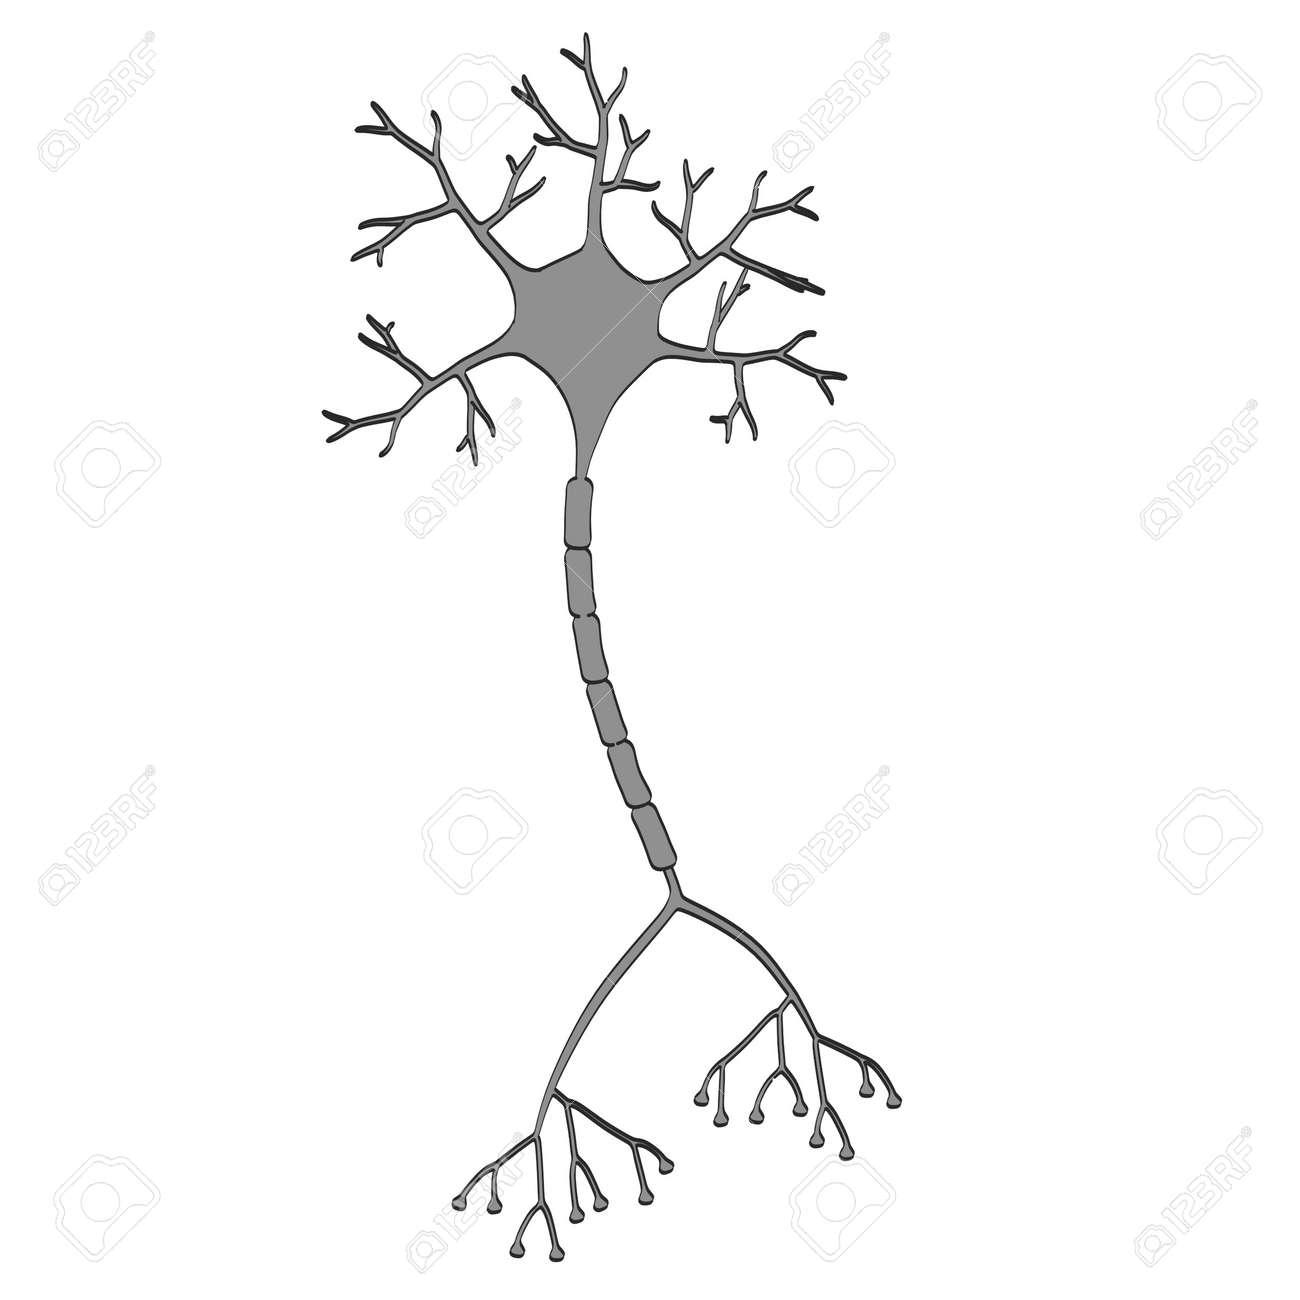 2d cartoon illustration of brain neuron stock photo picture and rh 123rf com neuron action potential explained neuron action potential diagram